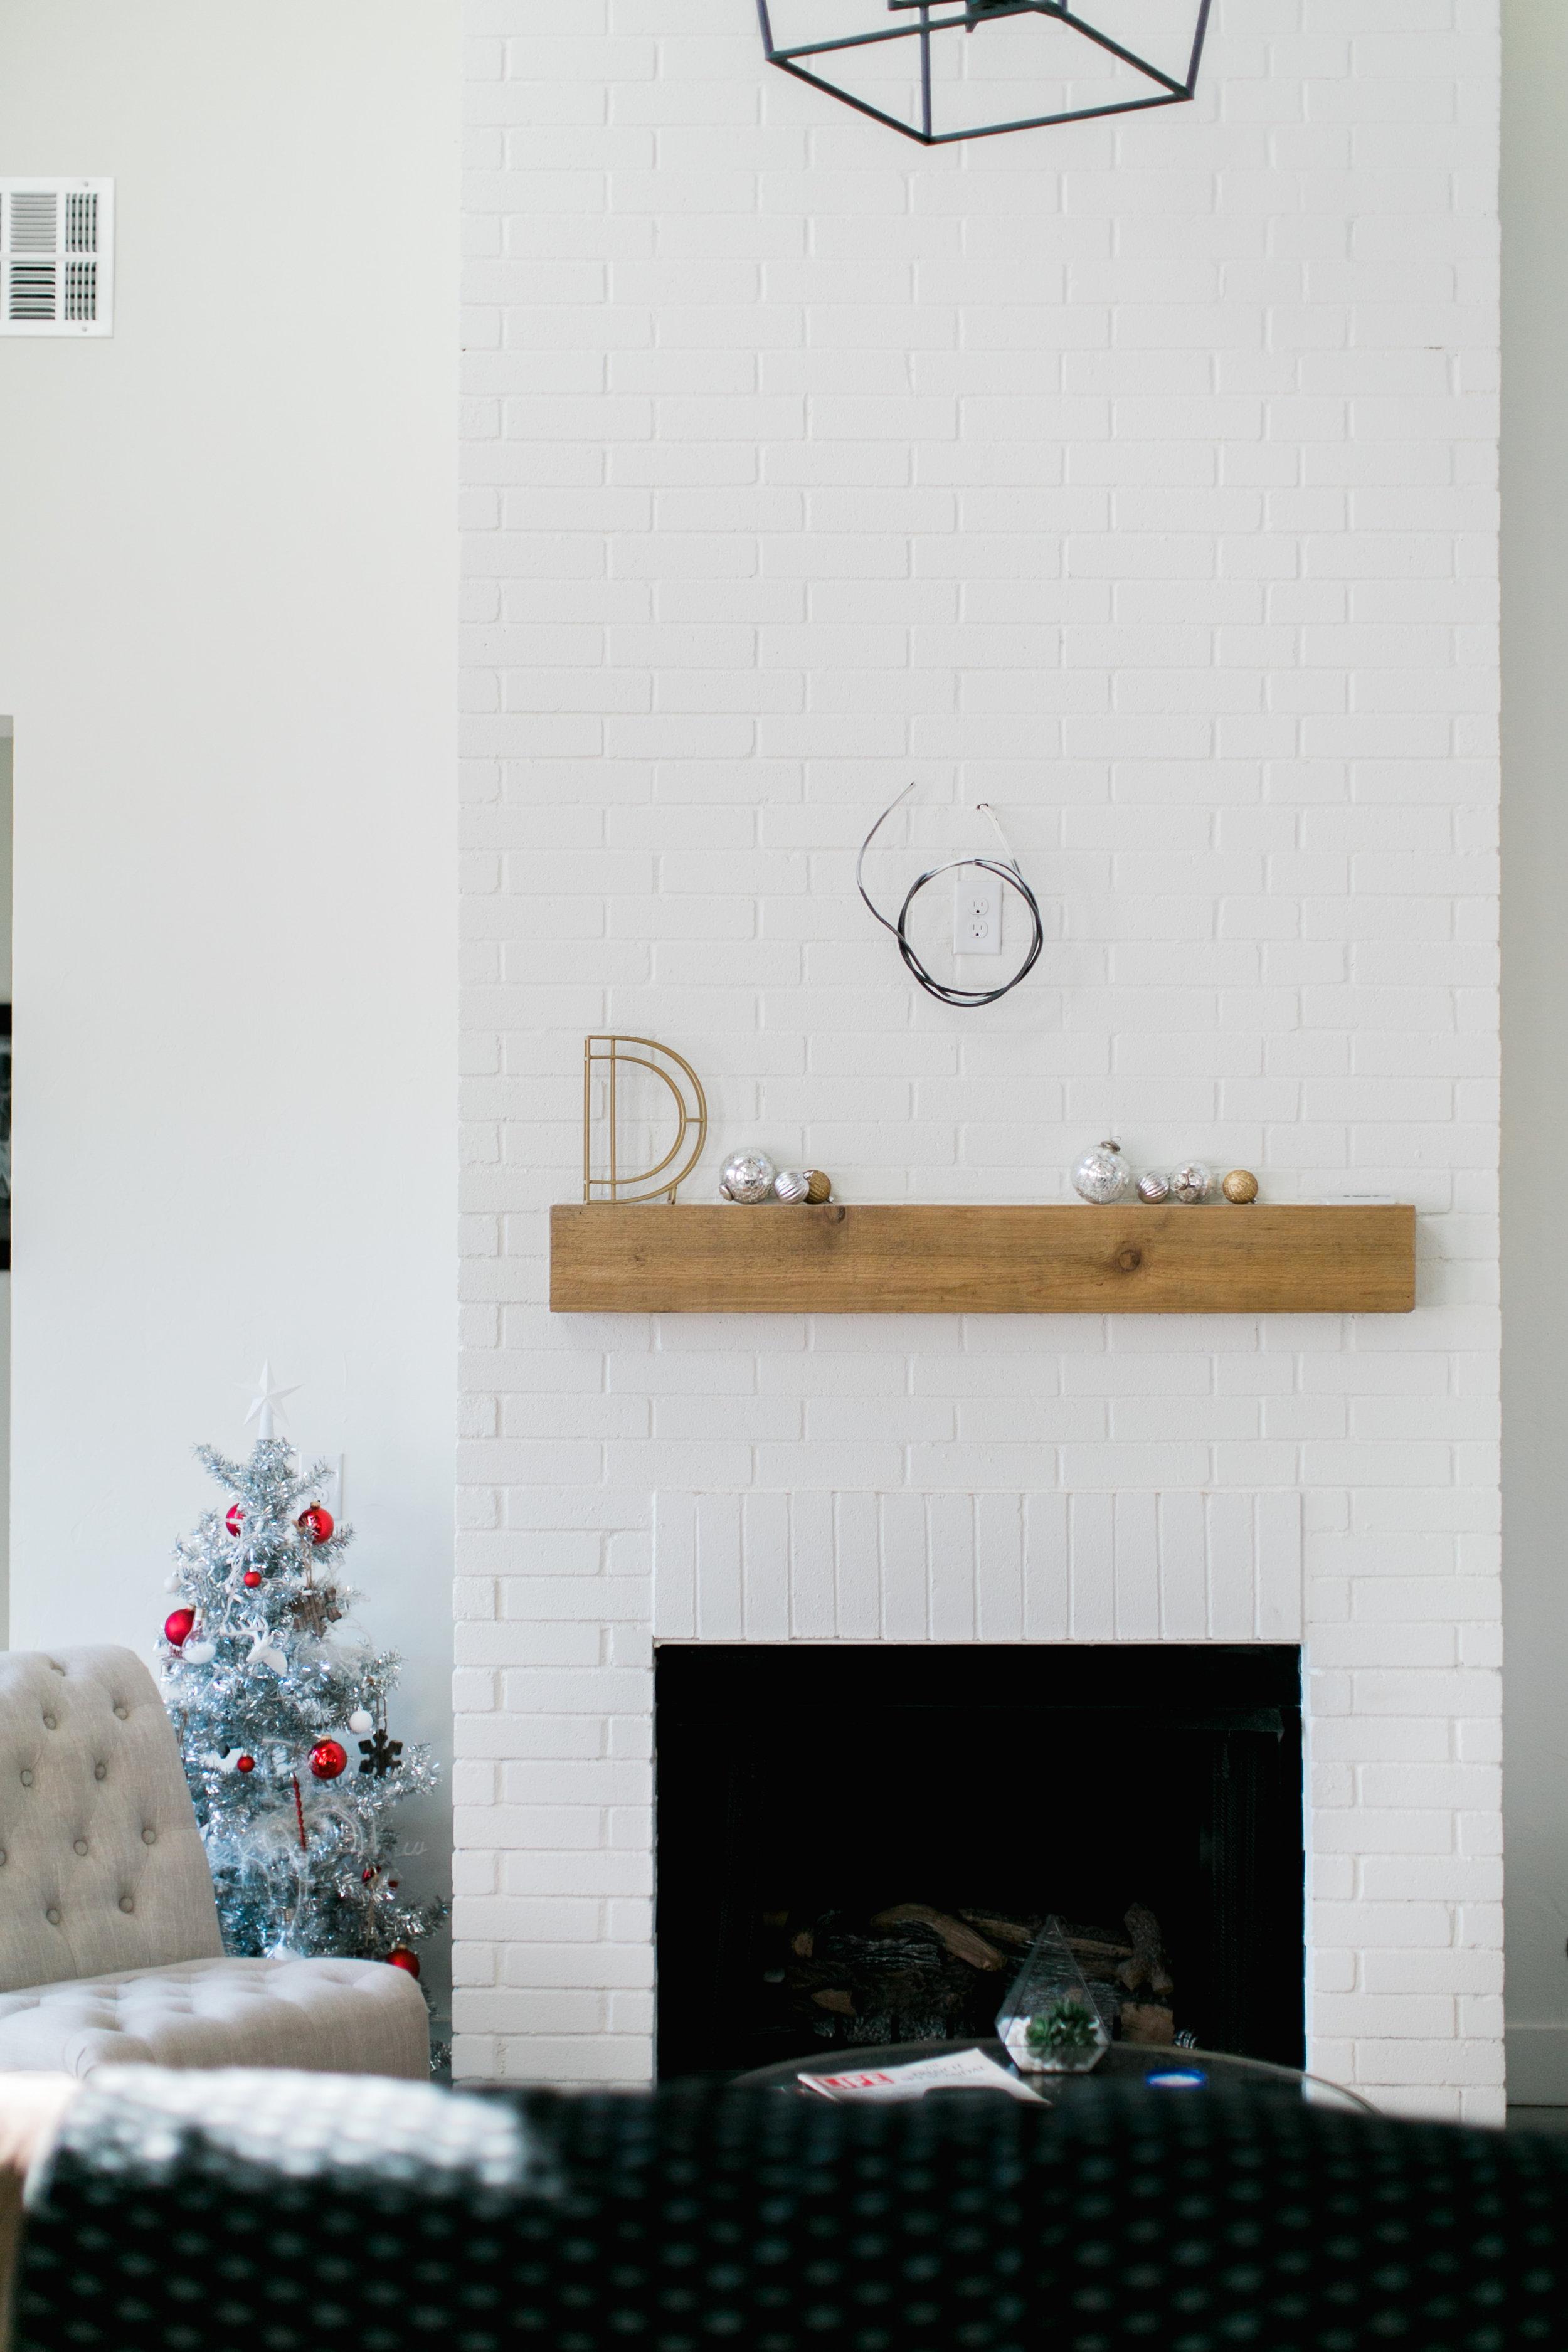 Depp-in-home-carsyn-abrams-photography-128.jpg